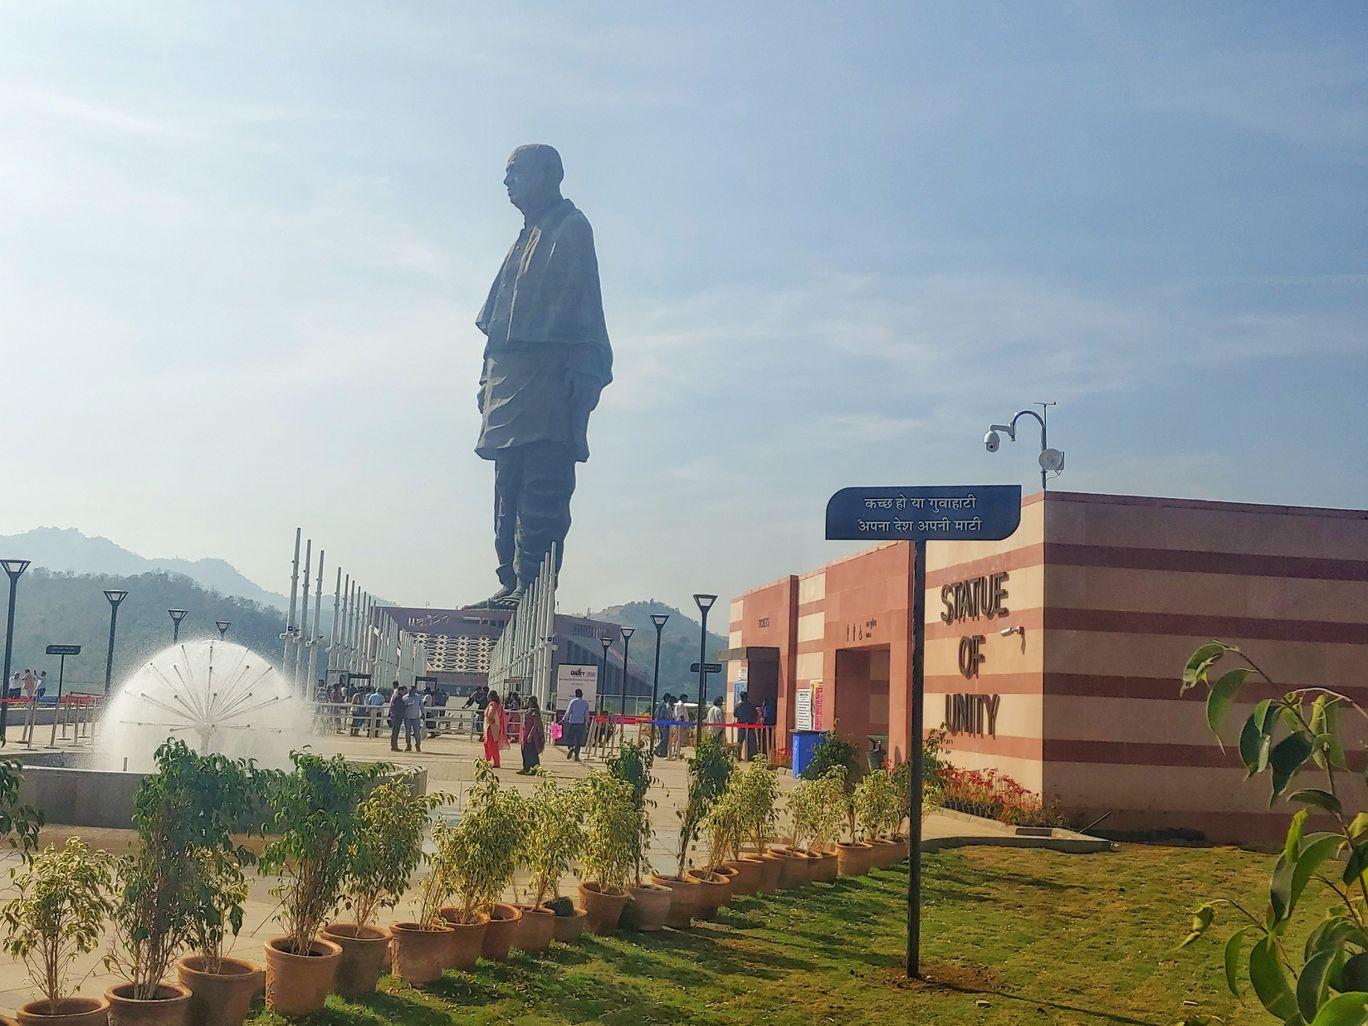 Photo of Statue of Unity By Naman Jain